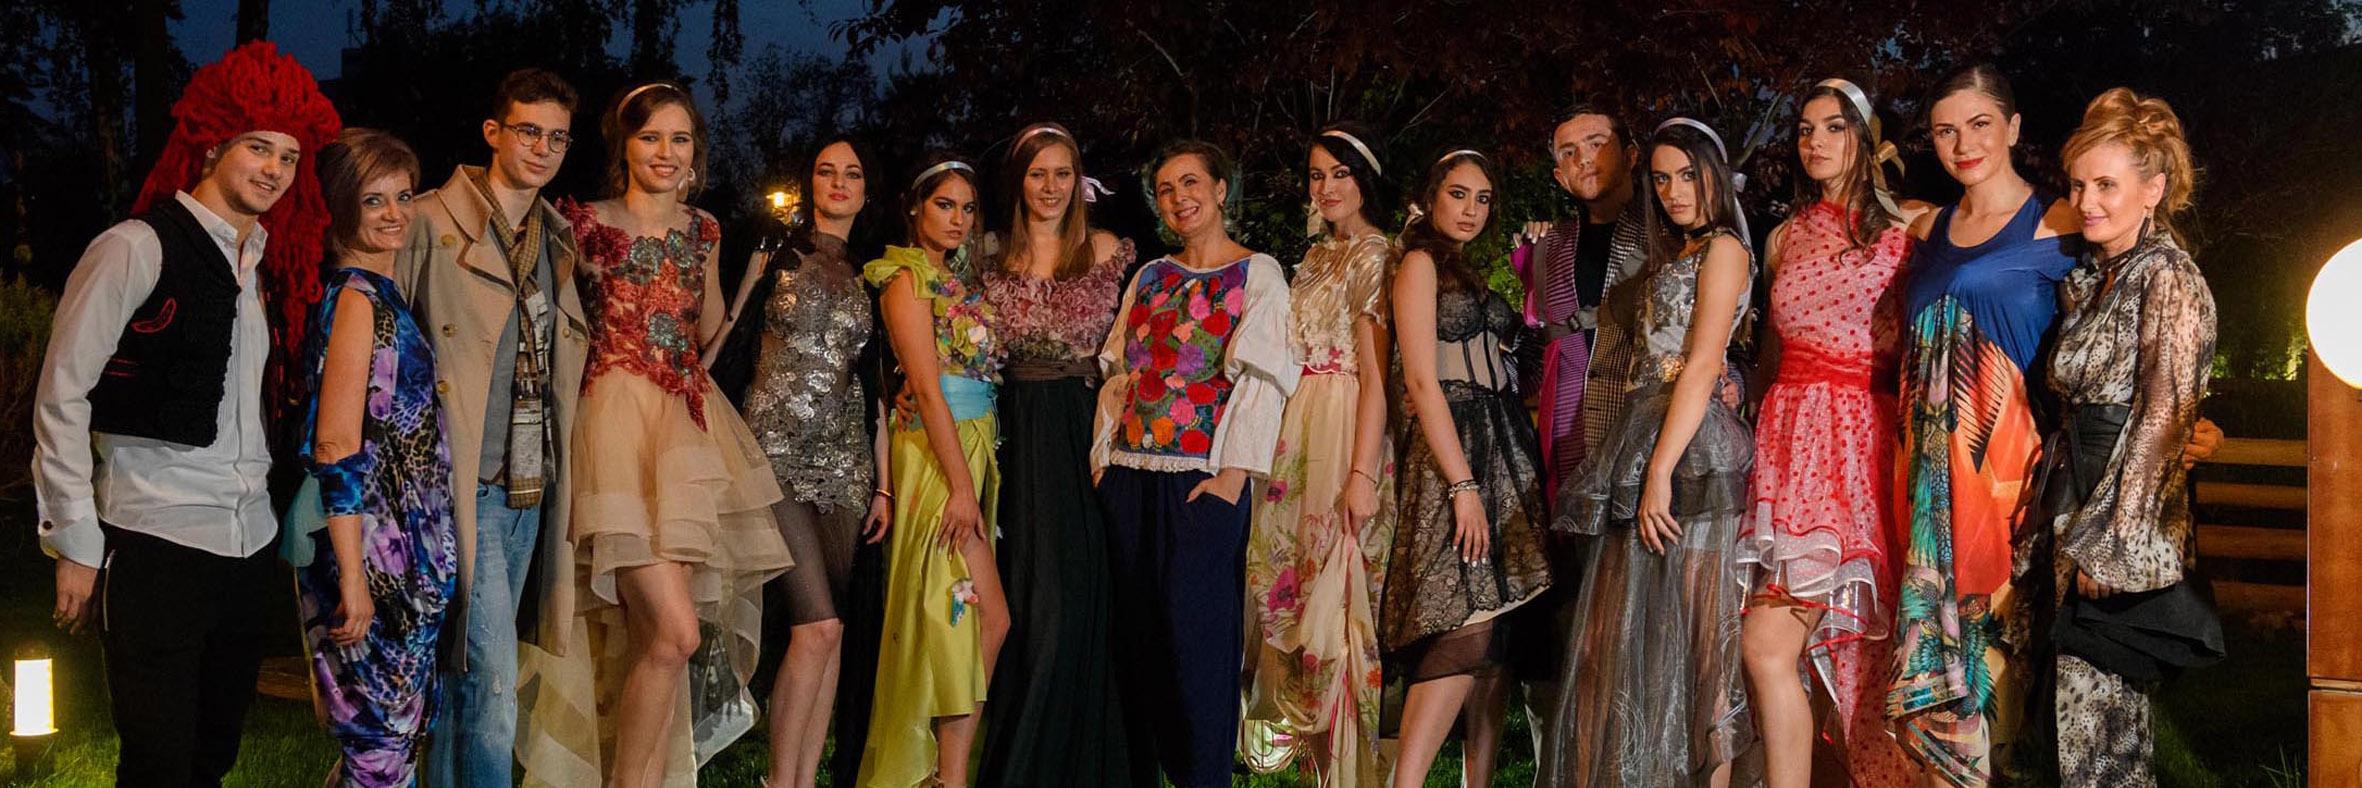 Chic by Vali Cioban Fashion Show - Rotaract Charity Ball 2017